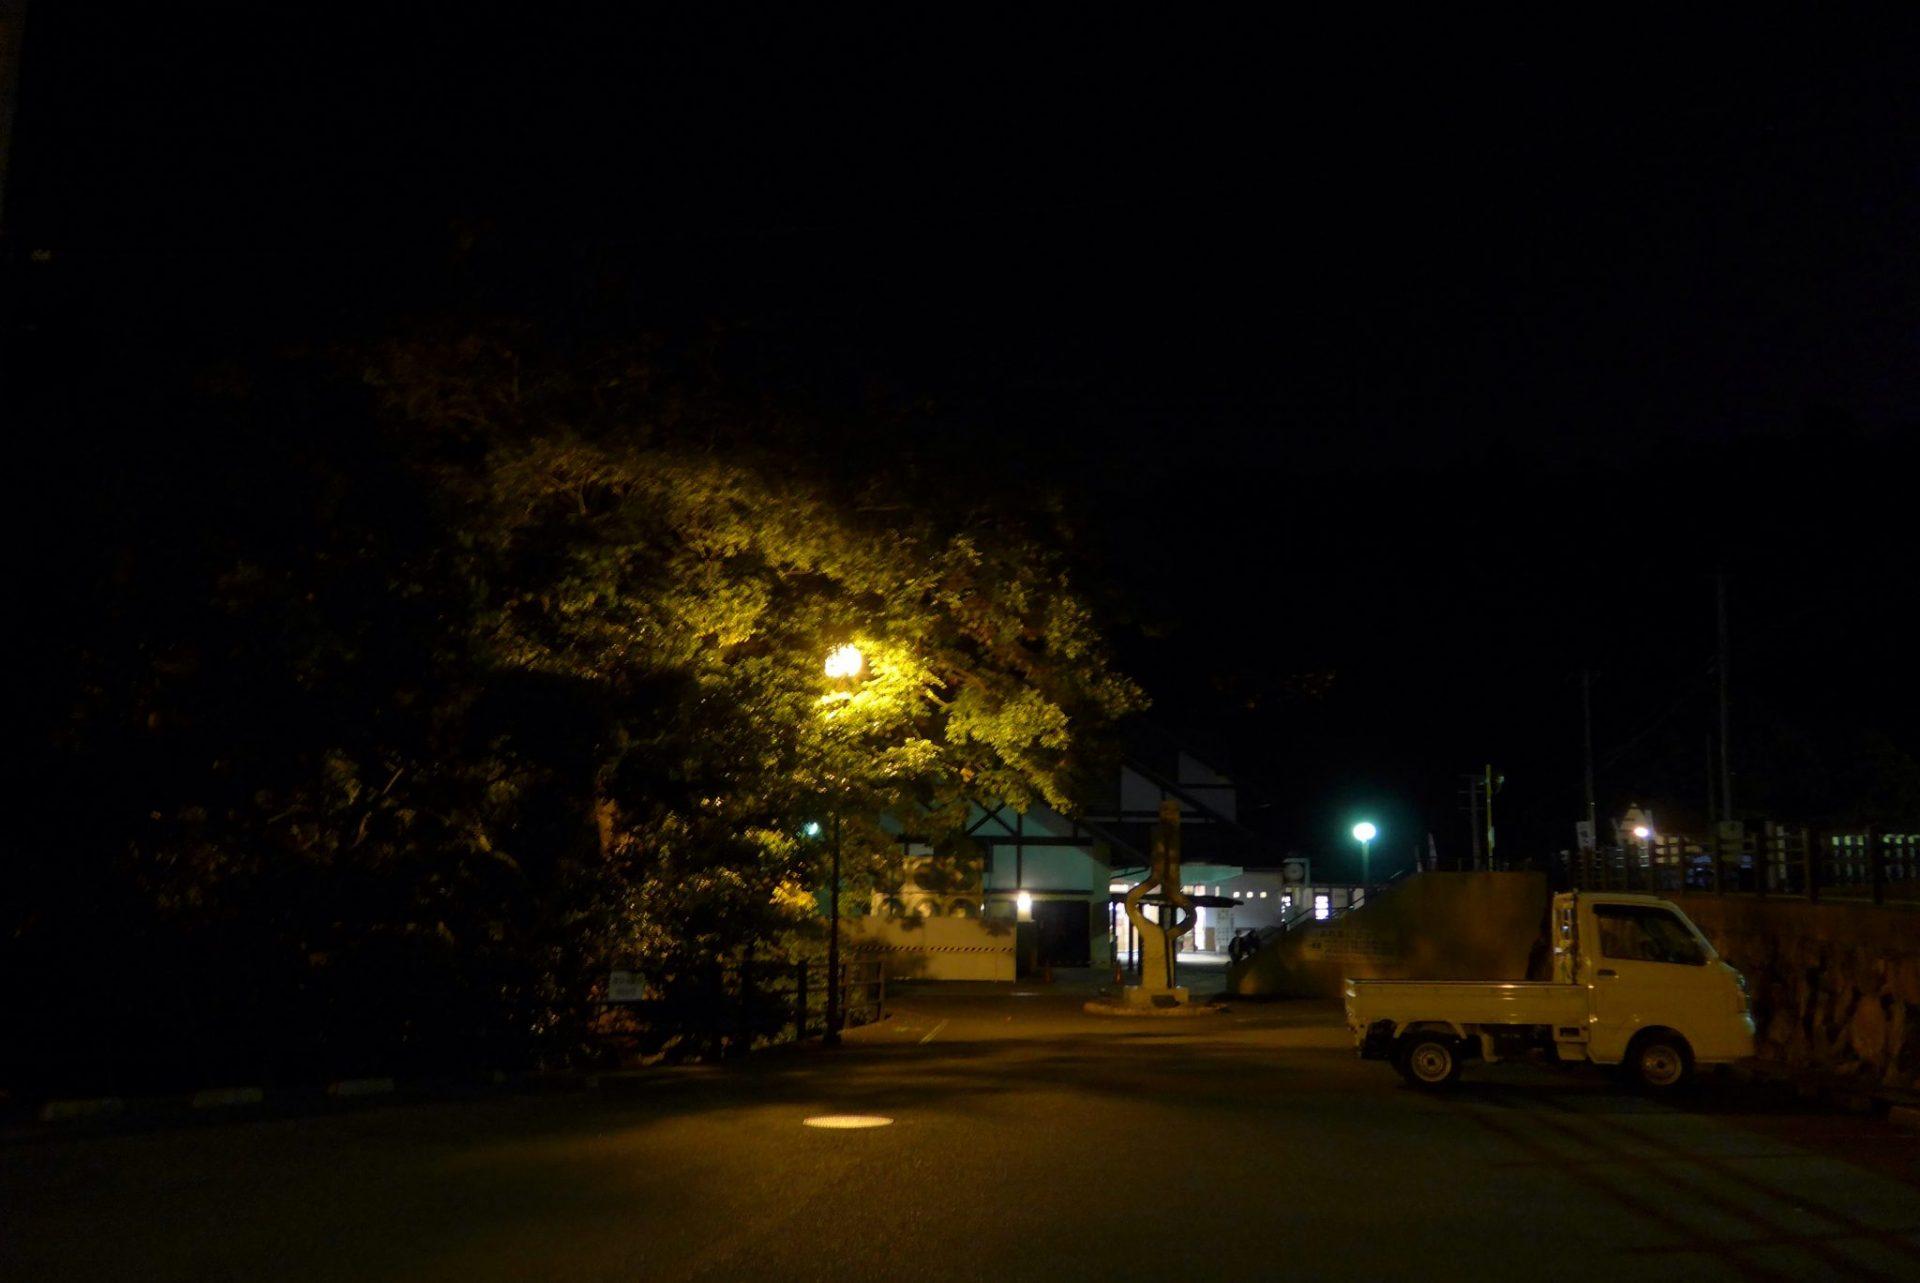 (K)香川県の塩入温泉は営業時間長い!〜トロトロお湯を楽しもう〜